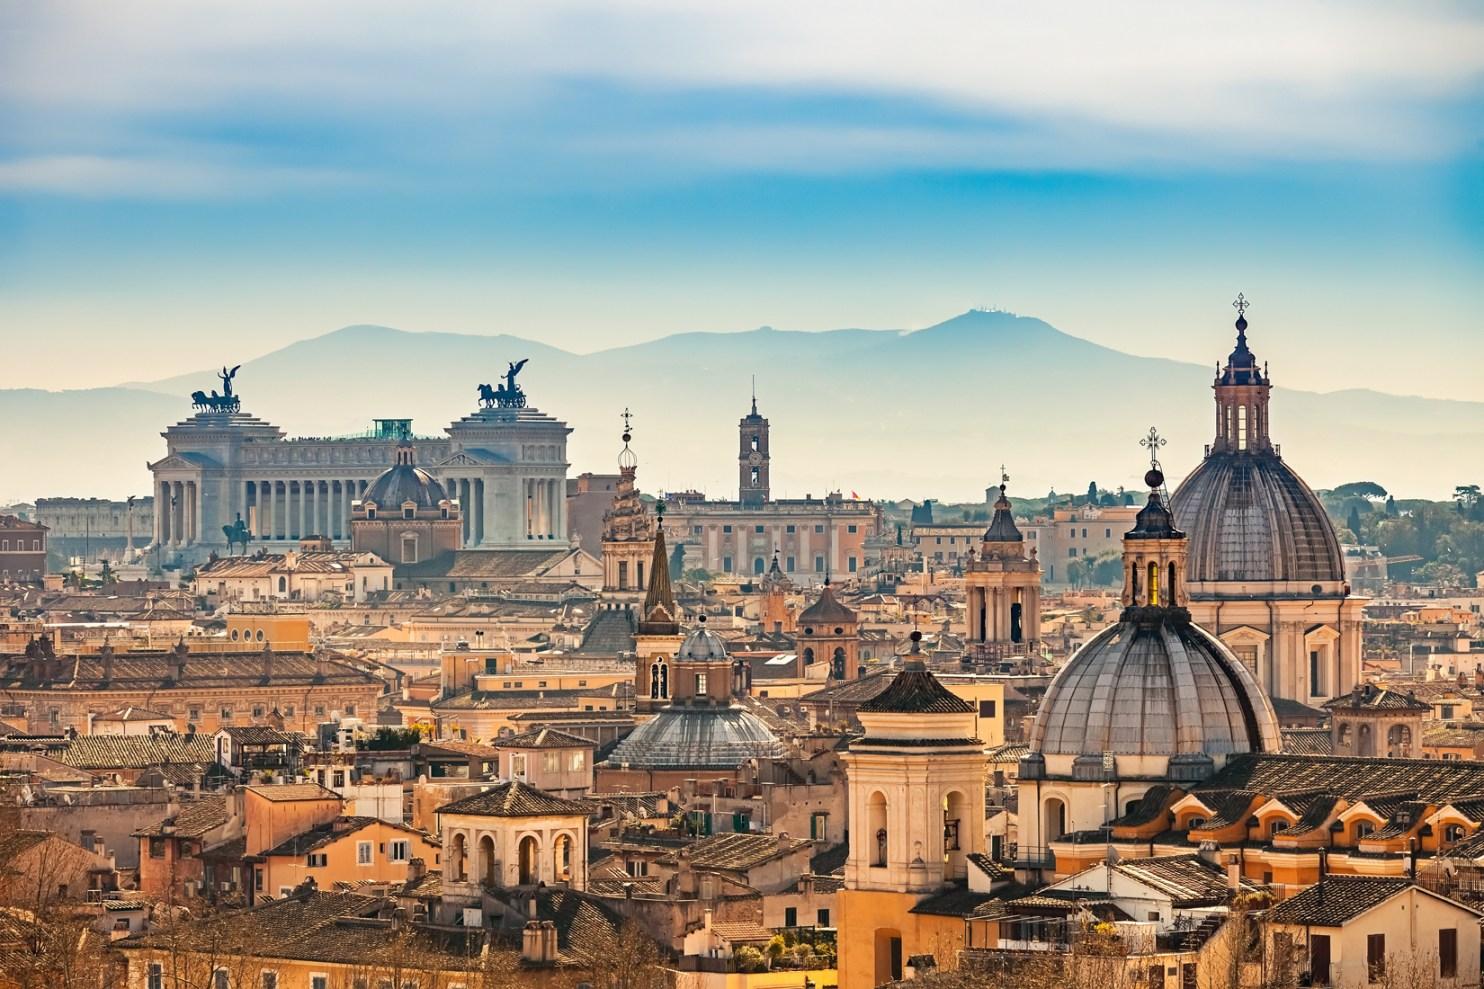 Rome skyline in the morning